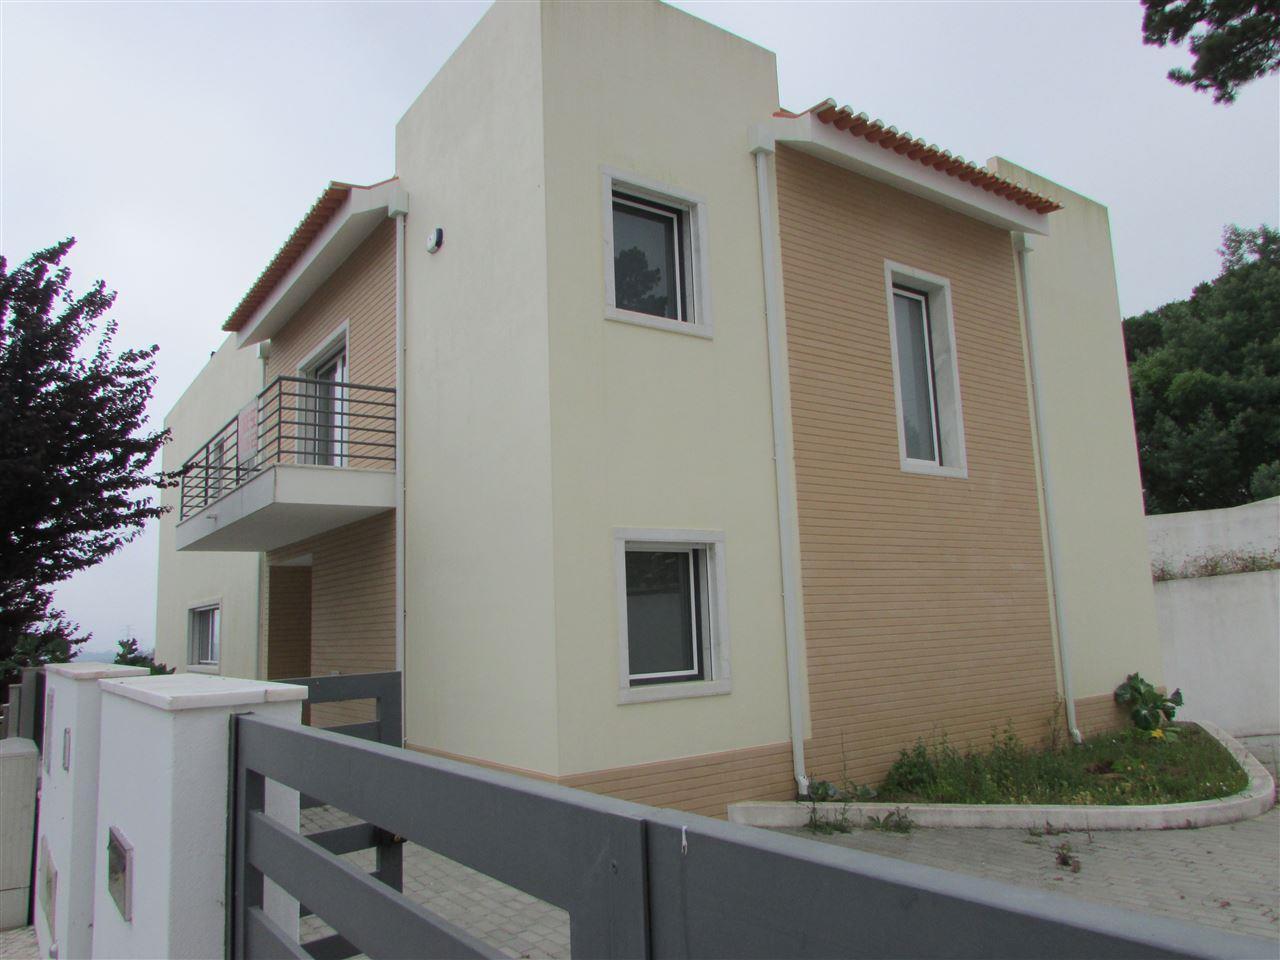 独户住宅 为 销售 在 House, 5 bedrooms, for Sale Sintra, 葡京 葡萄牙